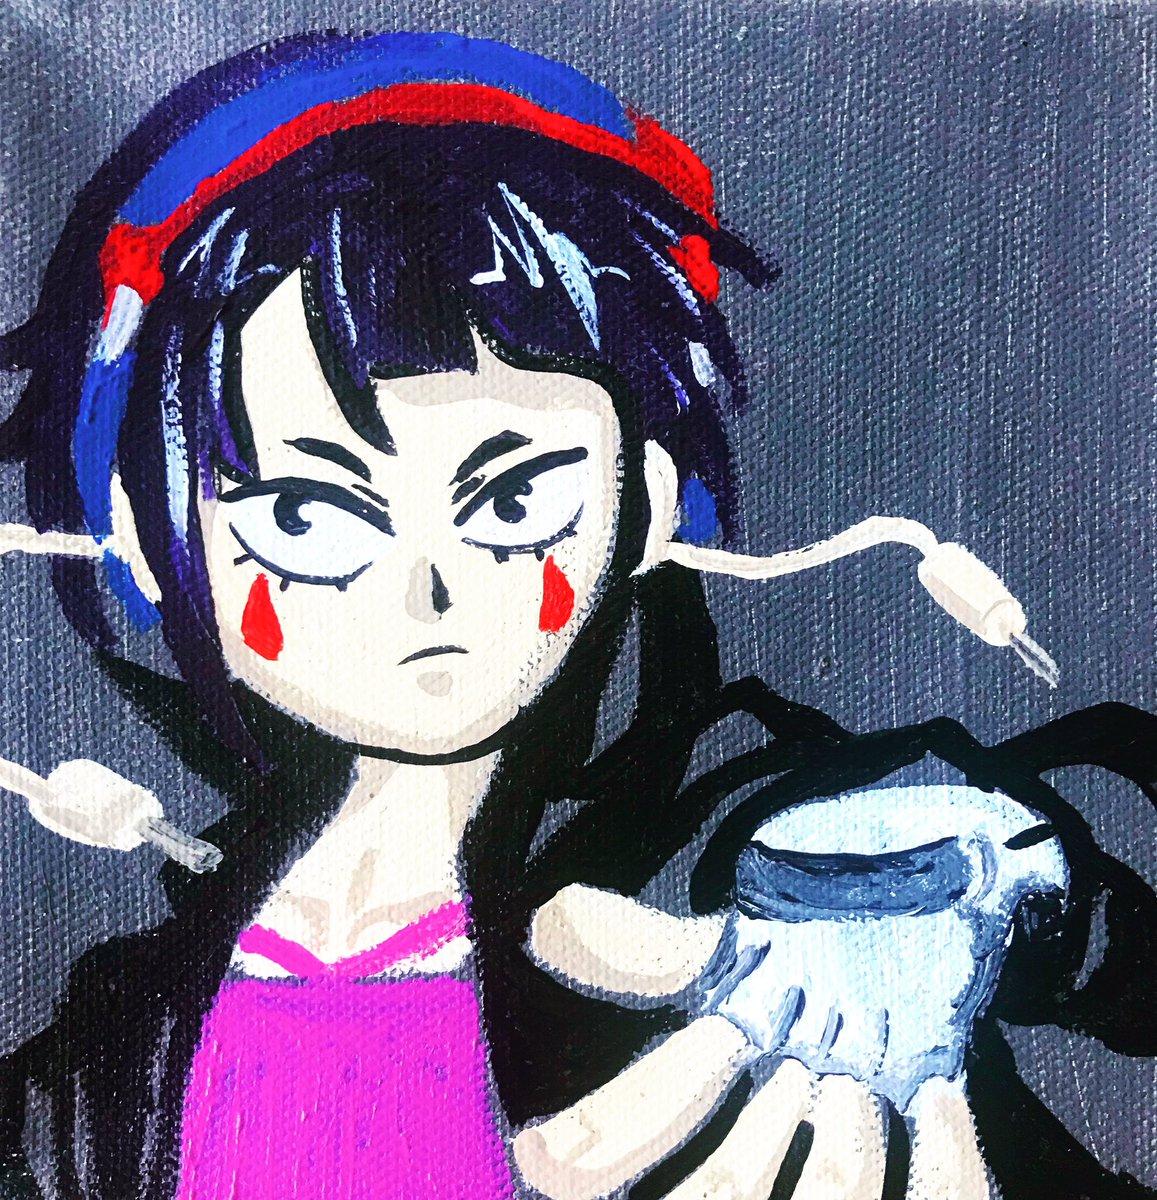 Day 121 of 365 Days of Art #365daysofart #fanart #myheroacademiaedits #allmight #shoutotodoroki #izukumidoriya #earphonejack #midnight #mtlady #toshinoriyagi #superhero #heroacademia #allforone #acrylicpainting #anime #manga #artofeli #artteacher #superman #neon #neonpaintingpic.twitter.com/f1ipGYS24s